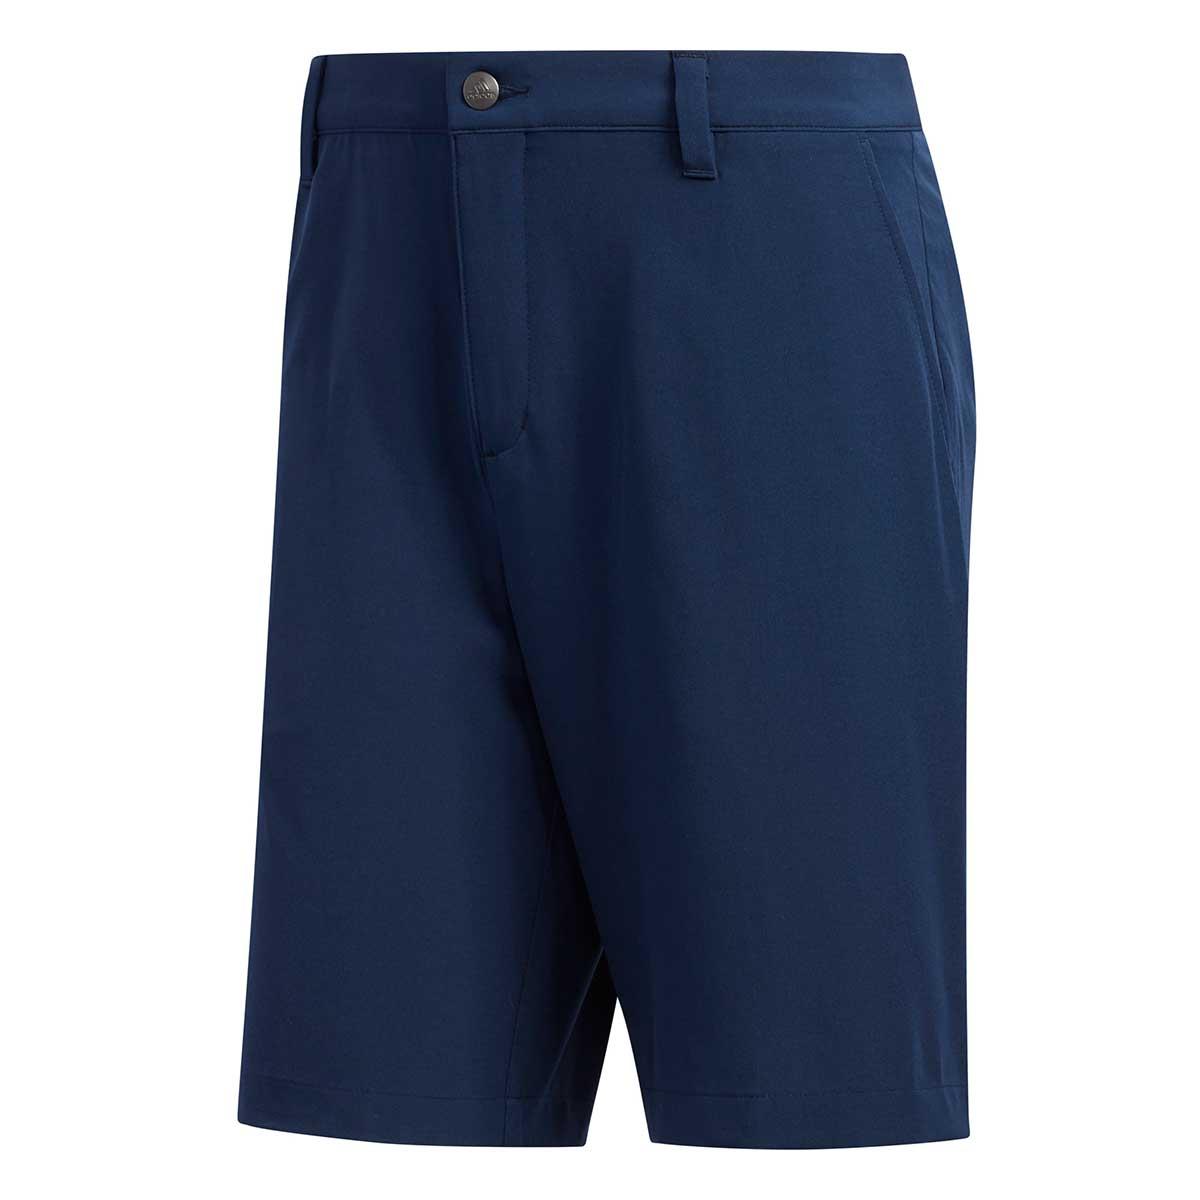 "Adidas Men's Ultimate365 9"" Navy Shorts"